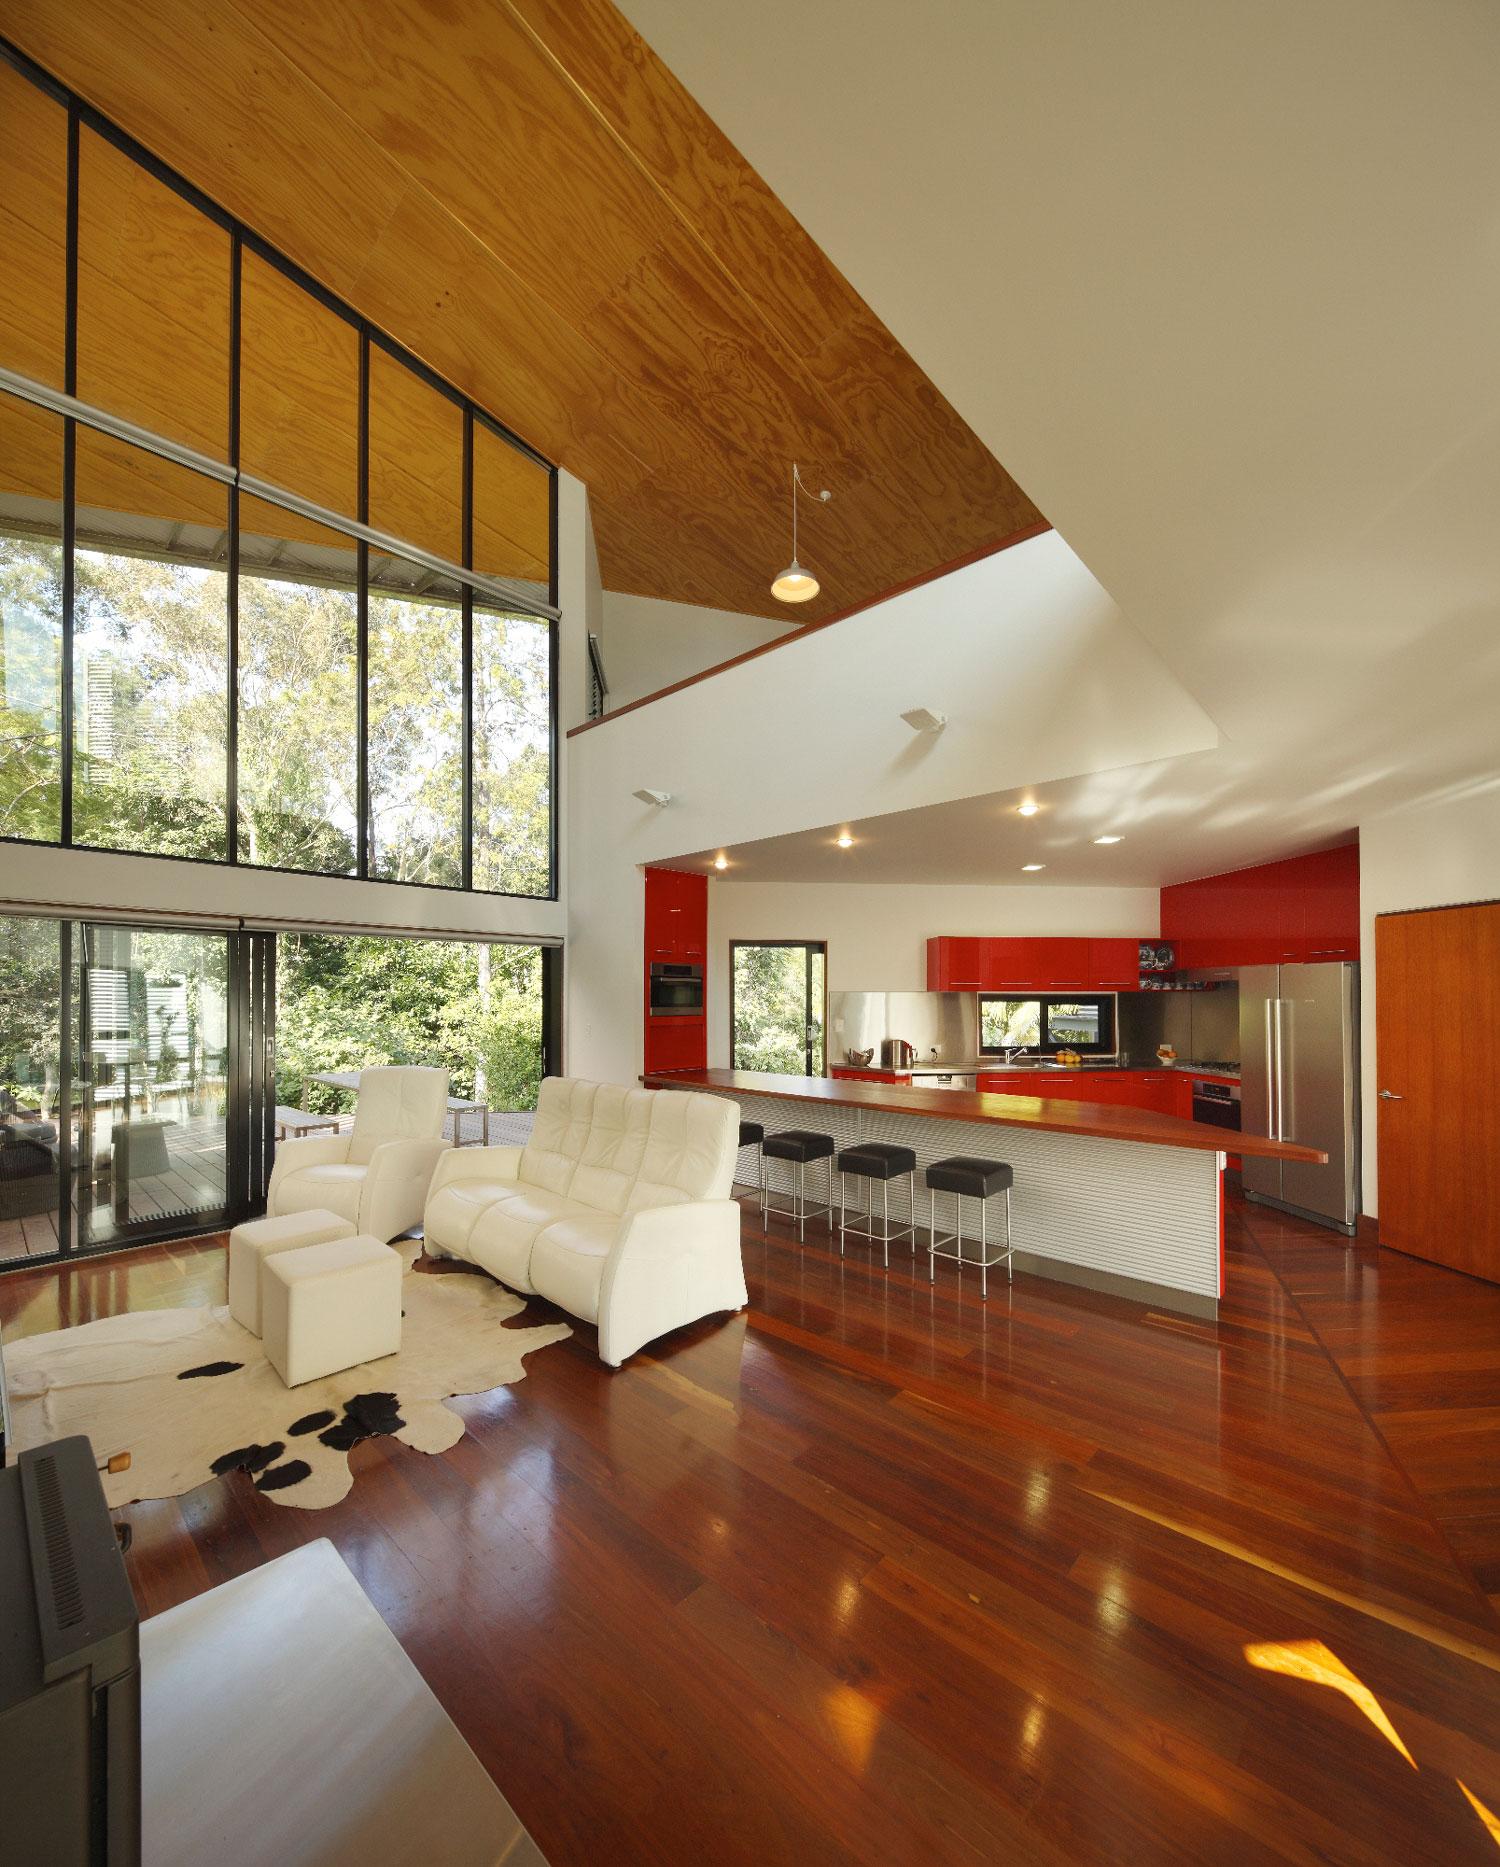 The-Gap-Residence-Guymer-Bailey-Architects-10.jpg